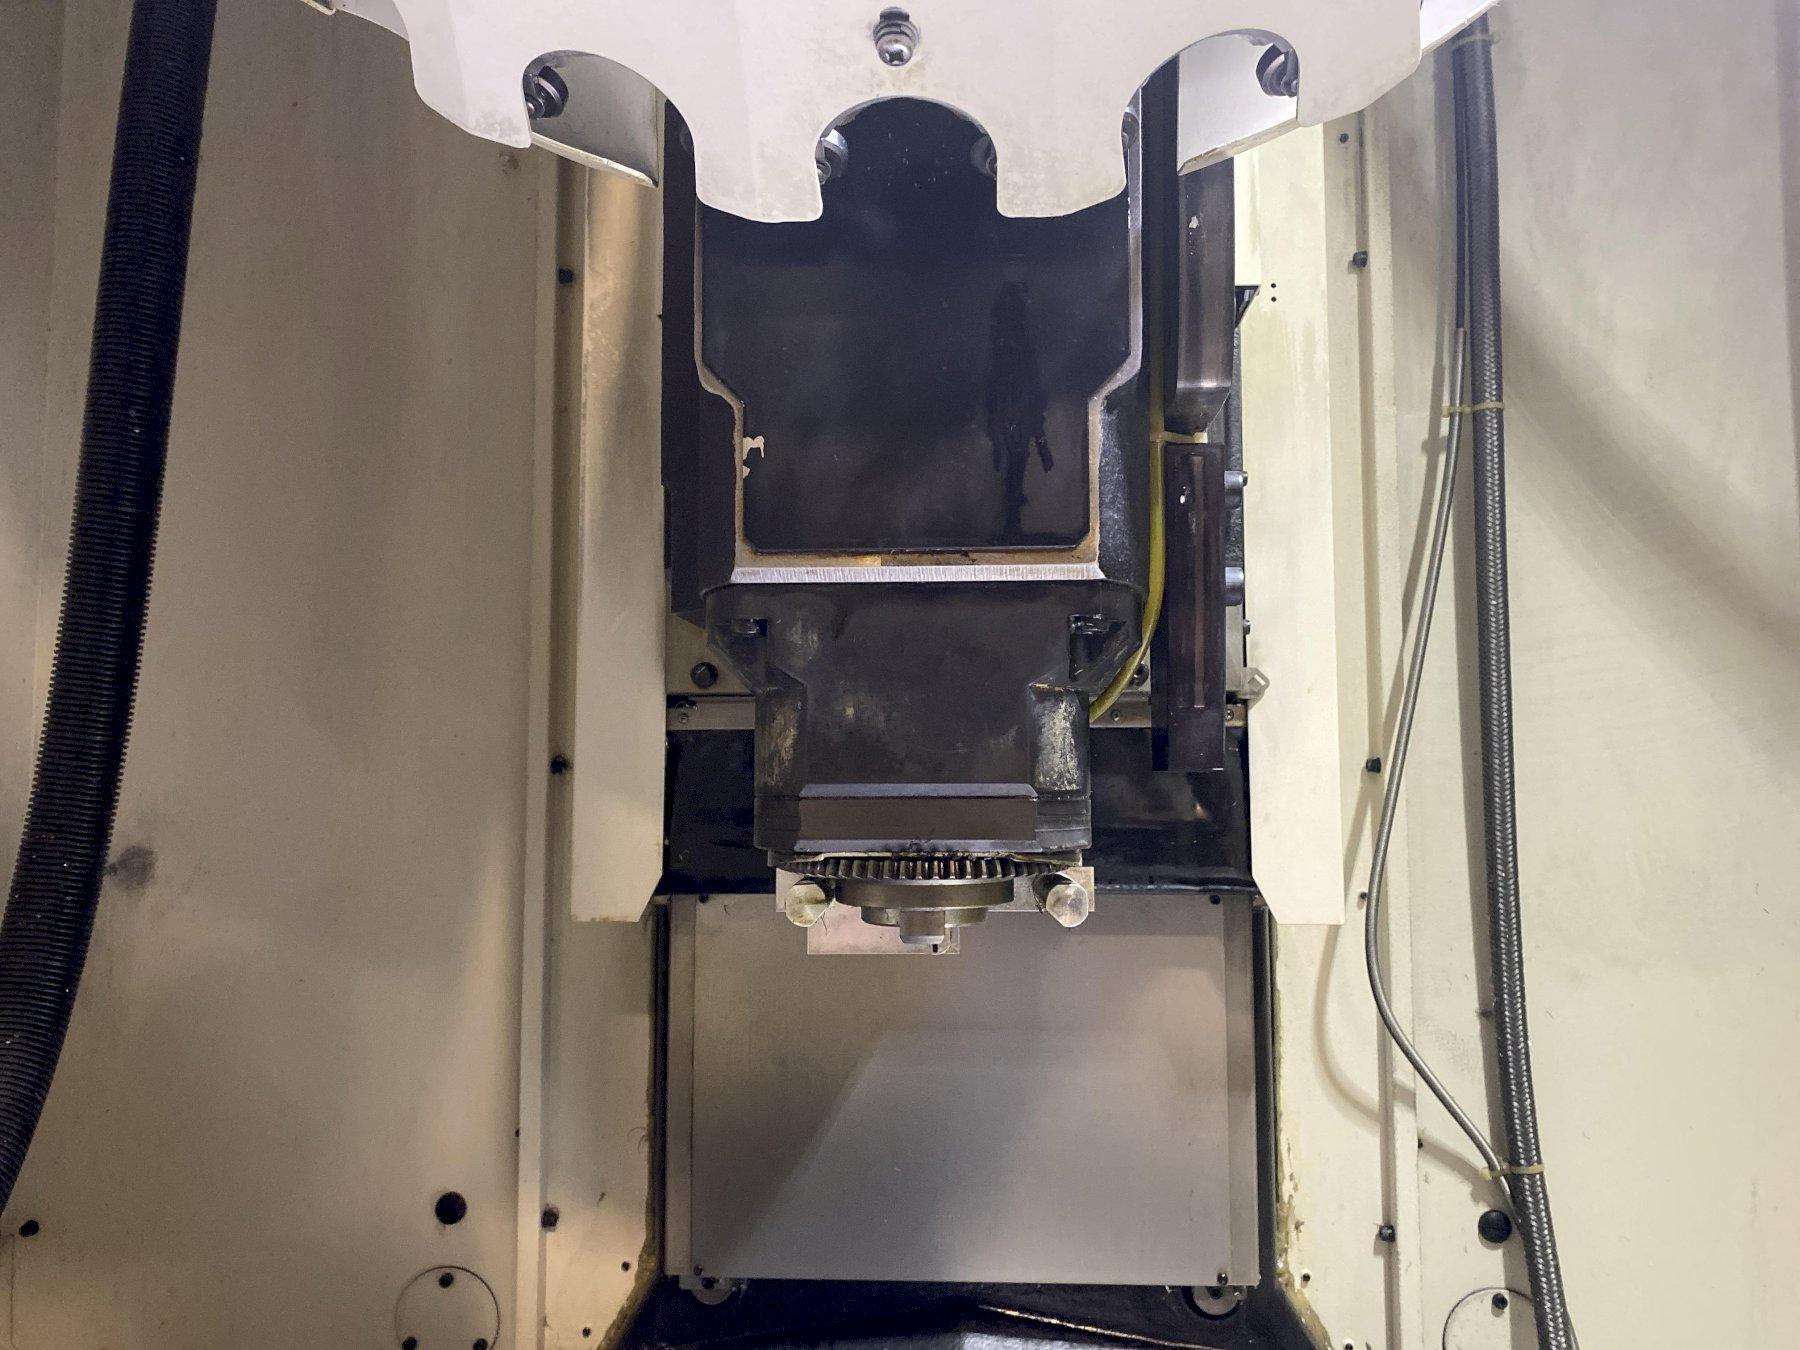 2014 FANUC Robodrill a-D21MiA - Vertical Machining Center